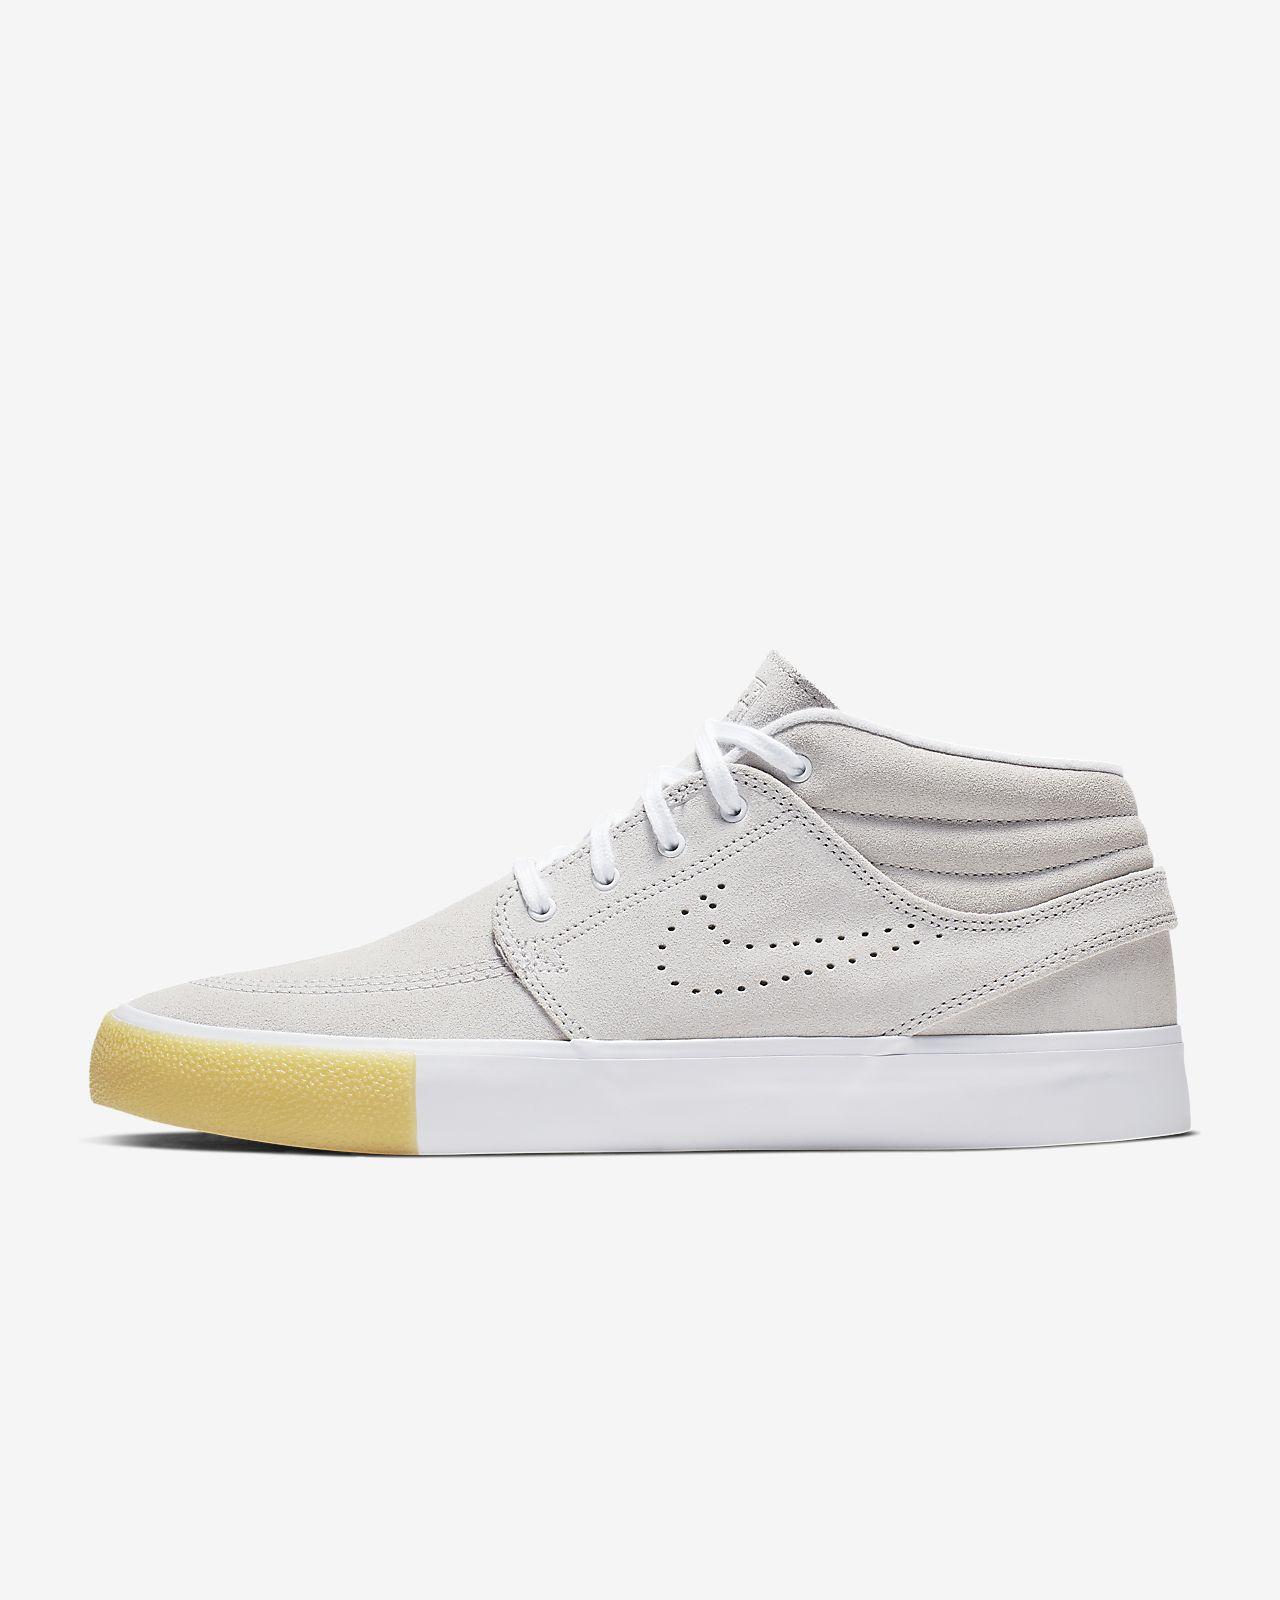 on sale 3fdff abccd Skate Shoe. Nike SB Zoom Janoski Mid RM SE